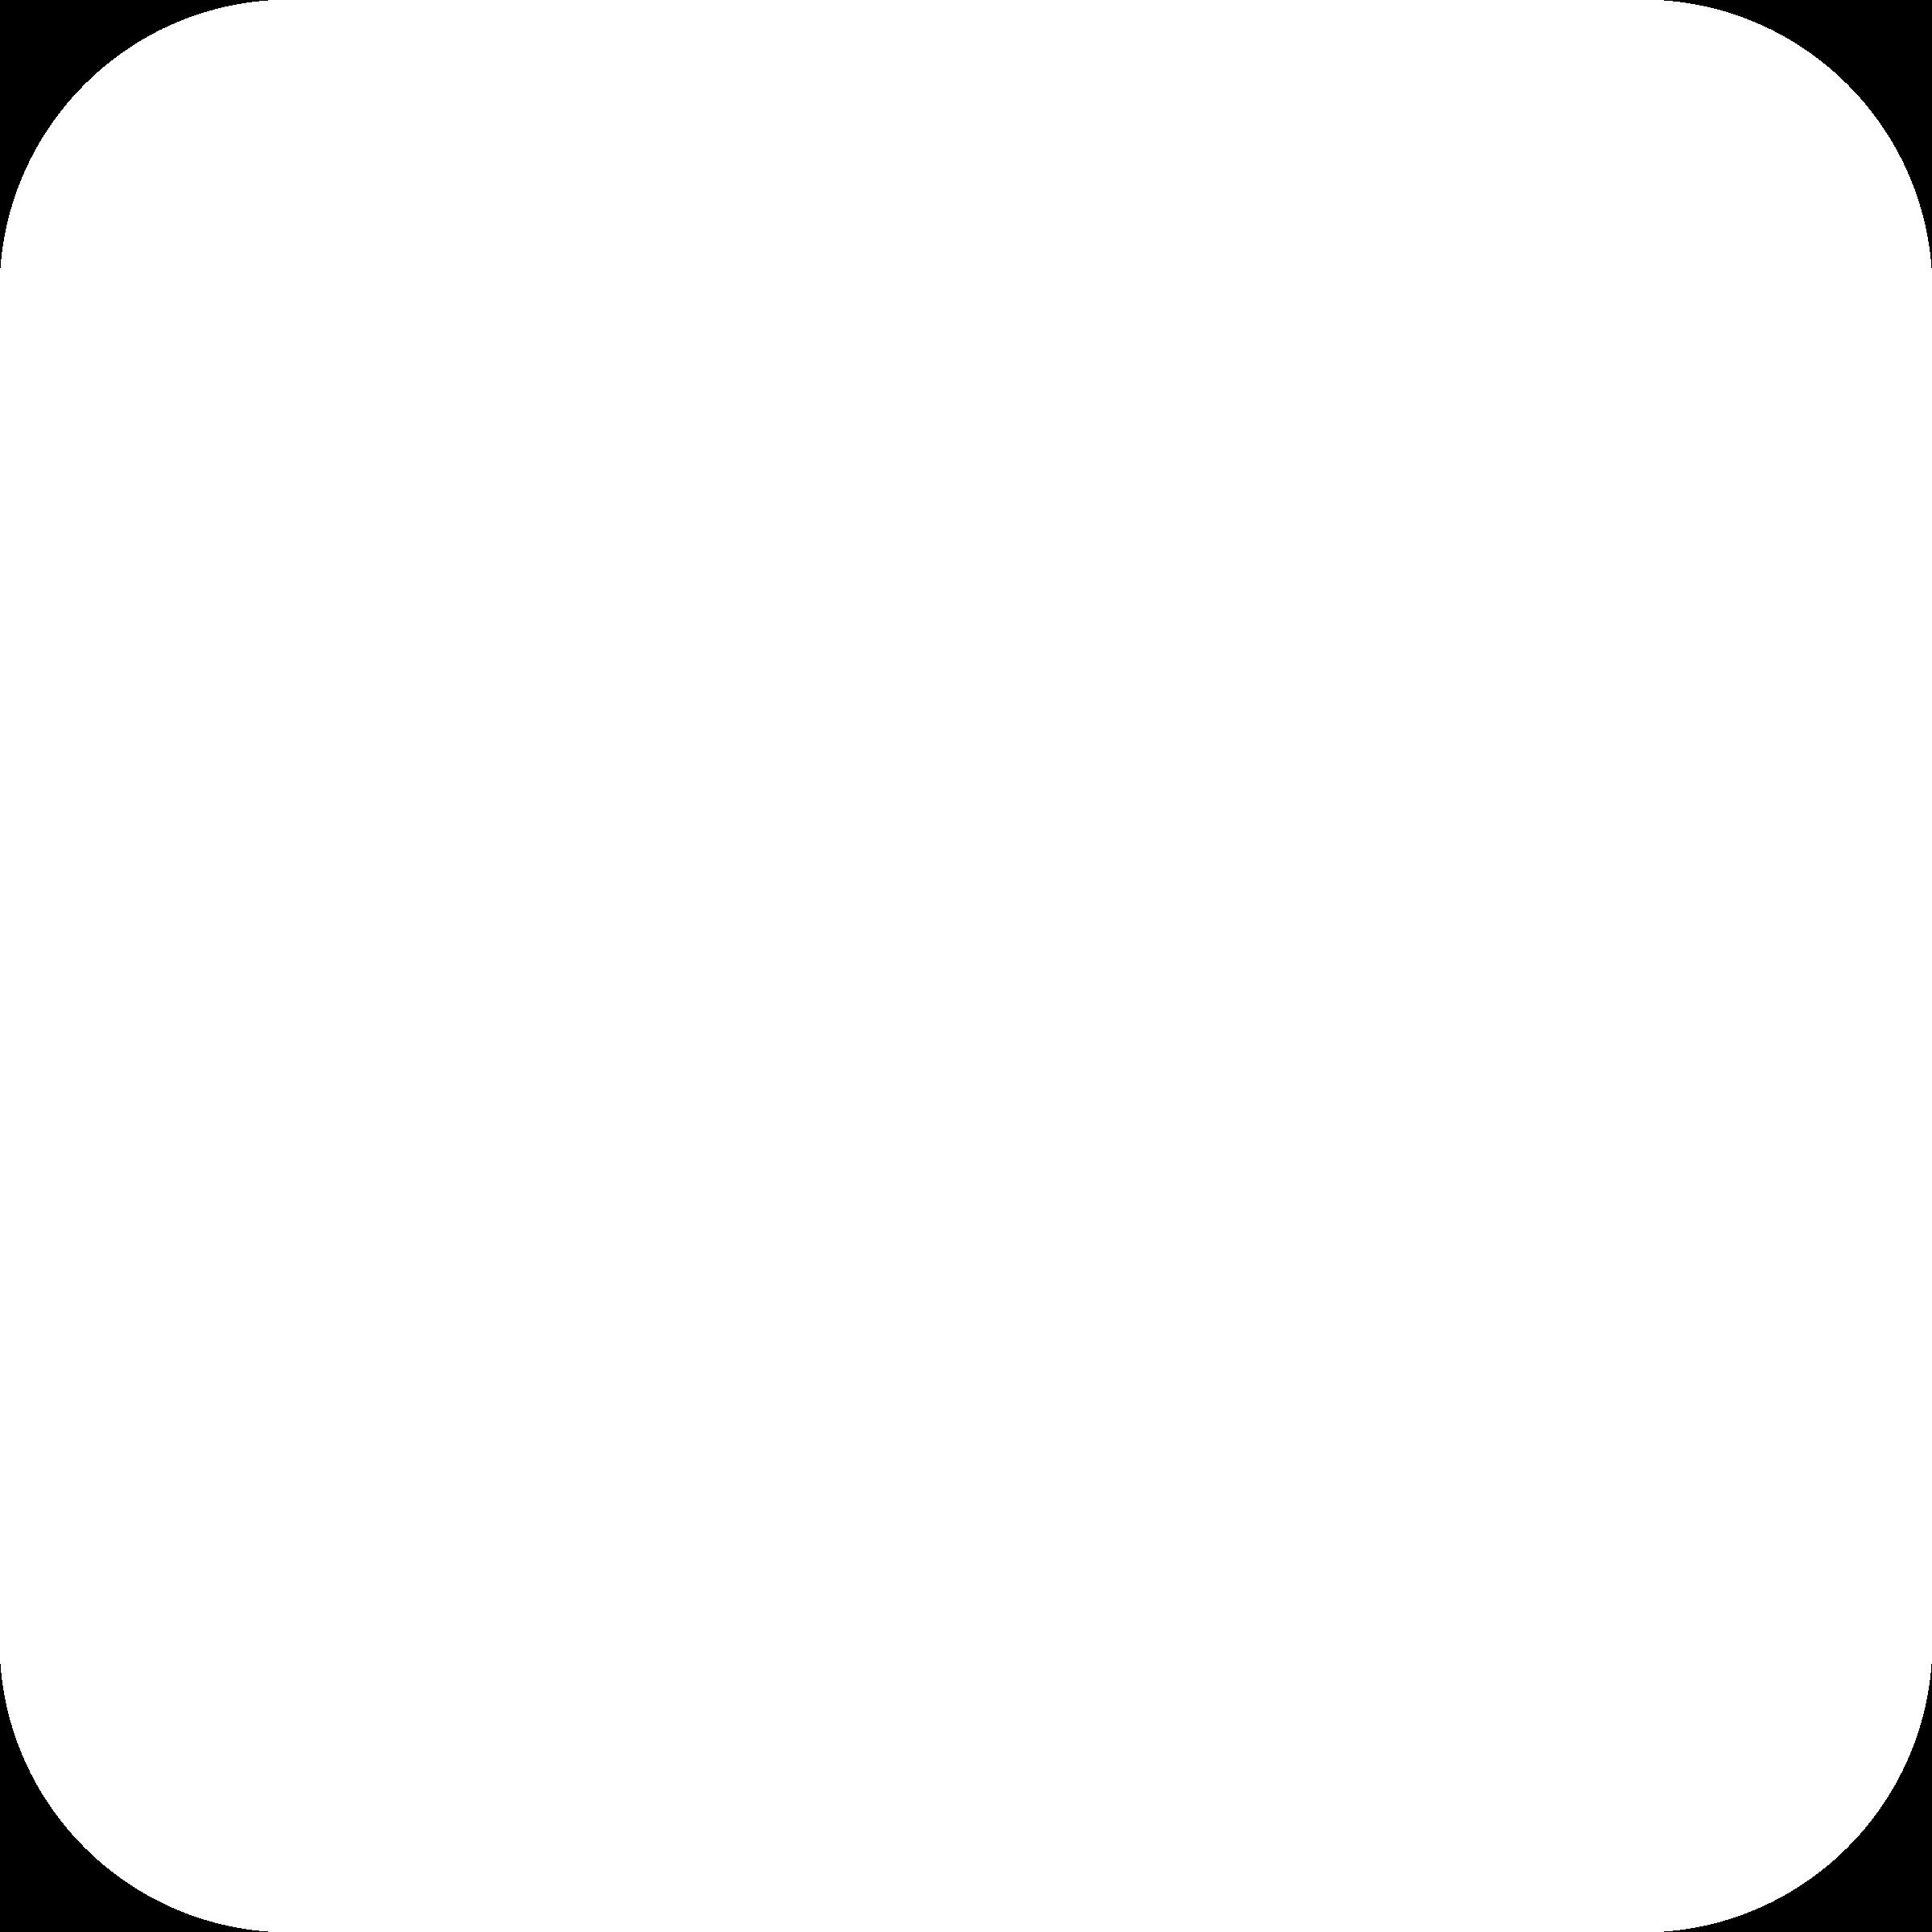 wechat grey logo png transparent svg vector freebie supply